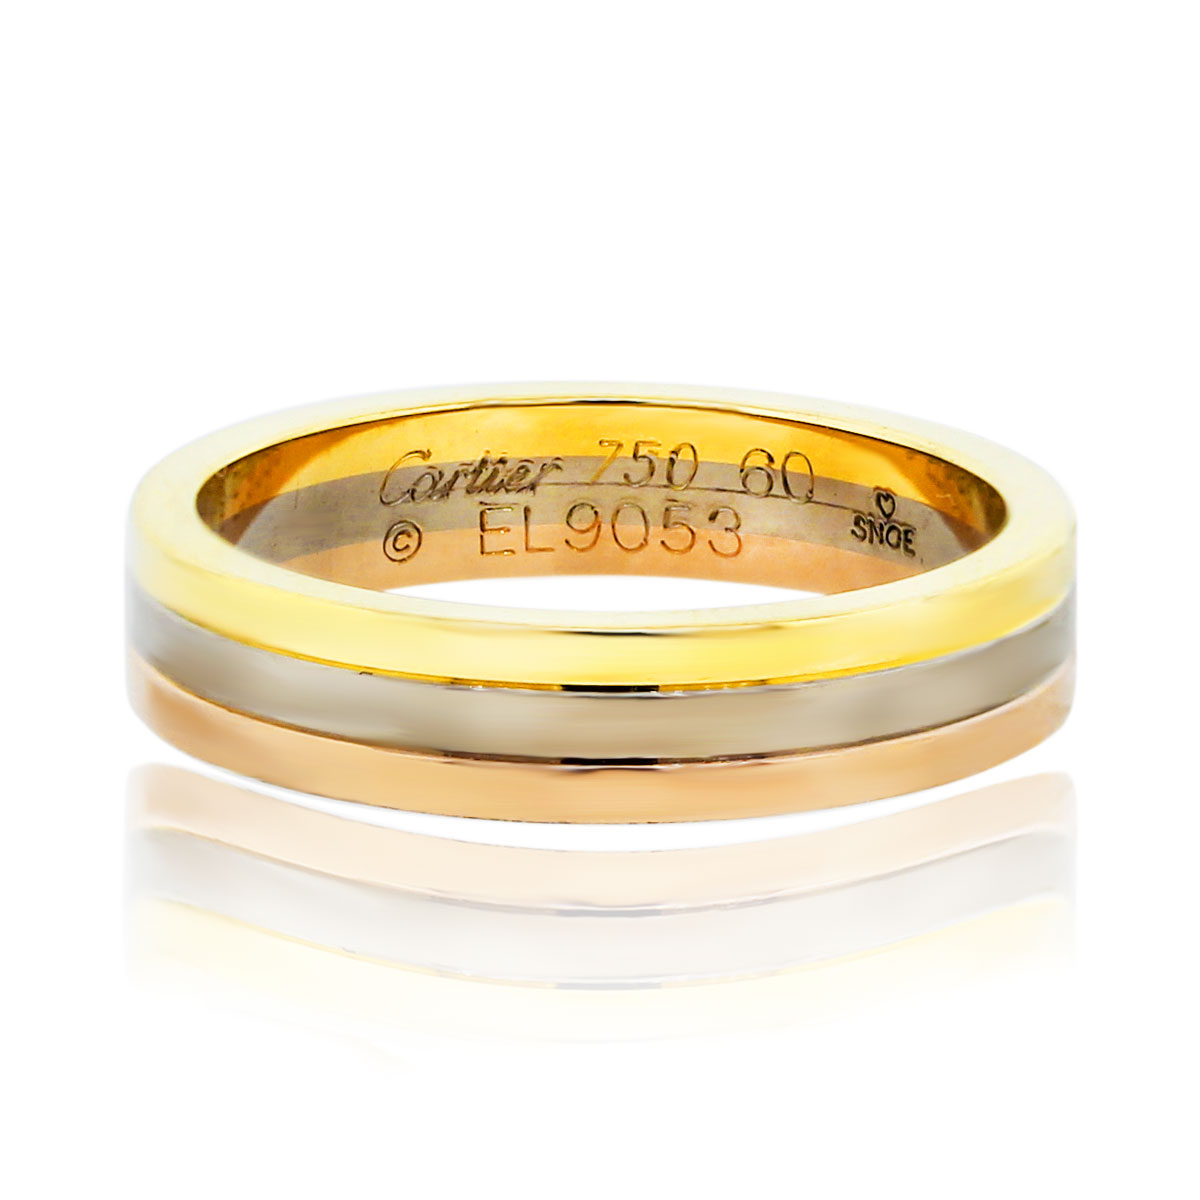 cartier tri color mens wedding band ring cartier wedding rings cartier jewelry cartier jewelry cartier jewelry cartier jewelry